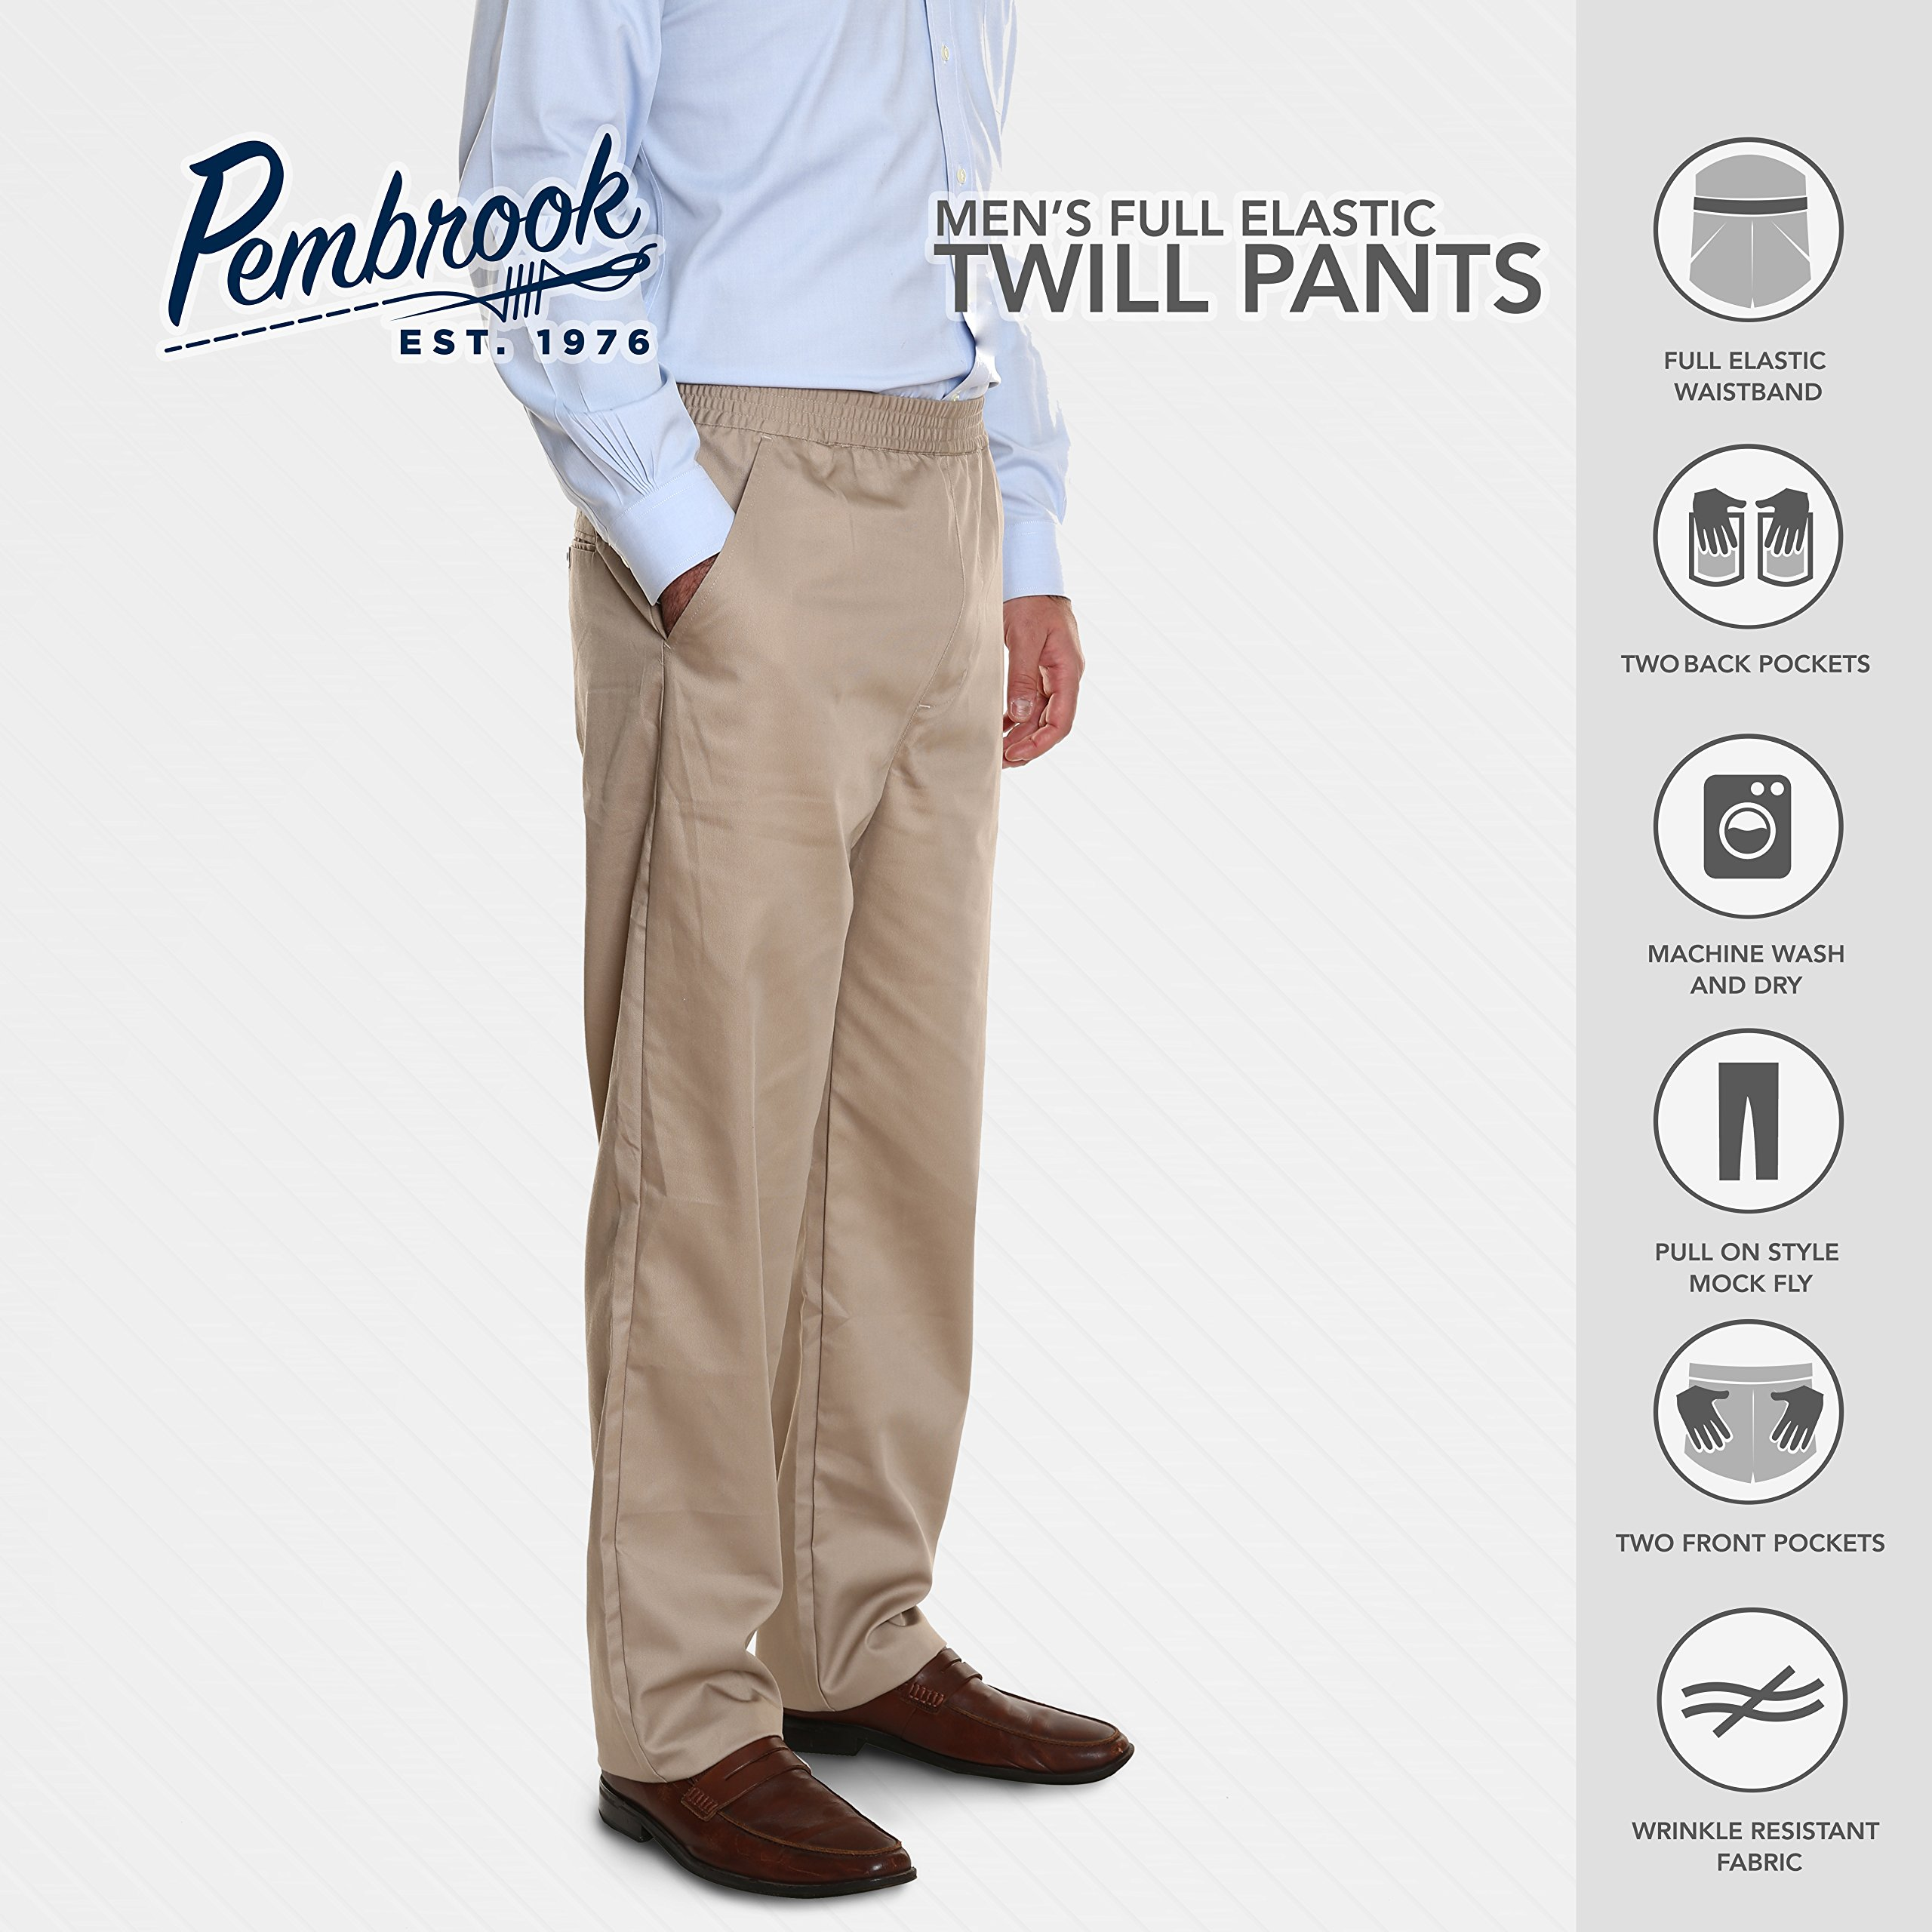 Pembrook Men's Full Elastic Waist Twill Casual Pant - L - Tan by Pembrook (Image #7)